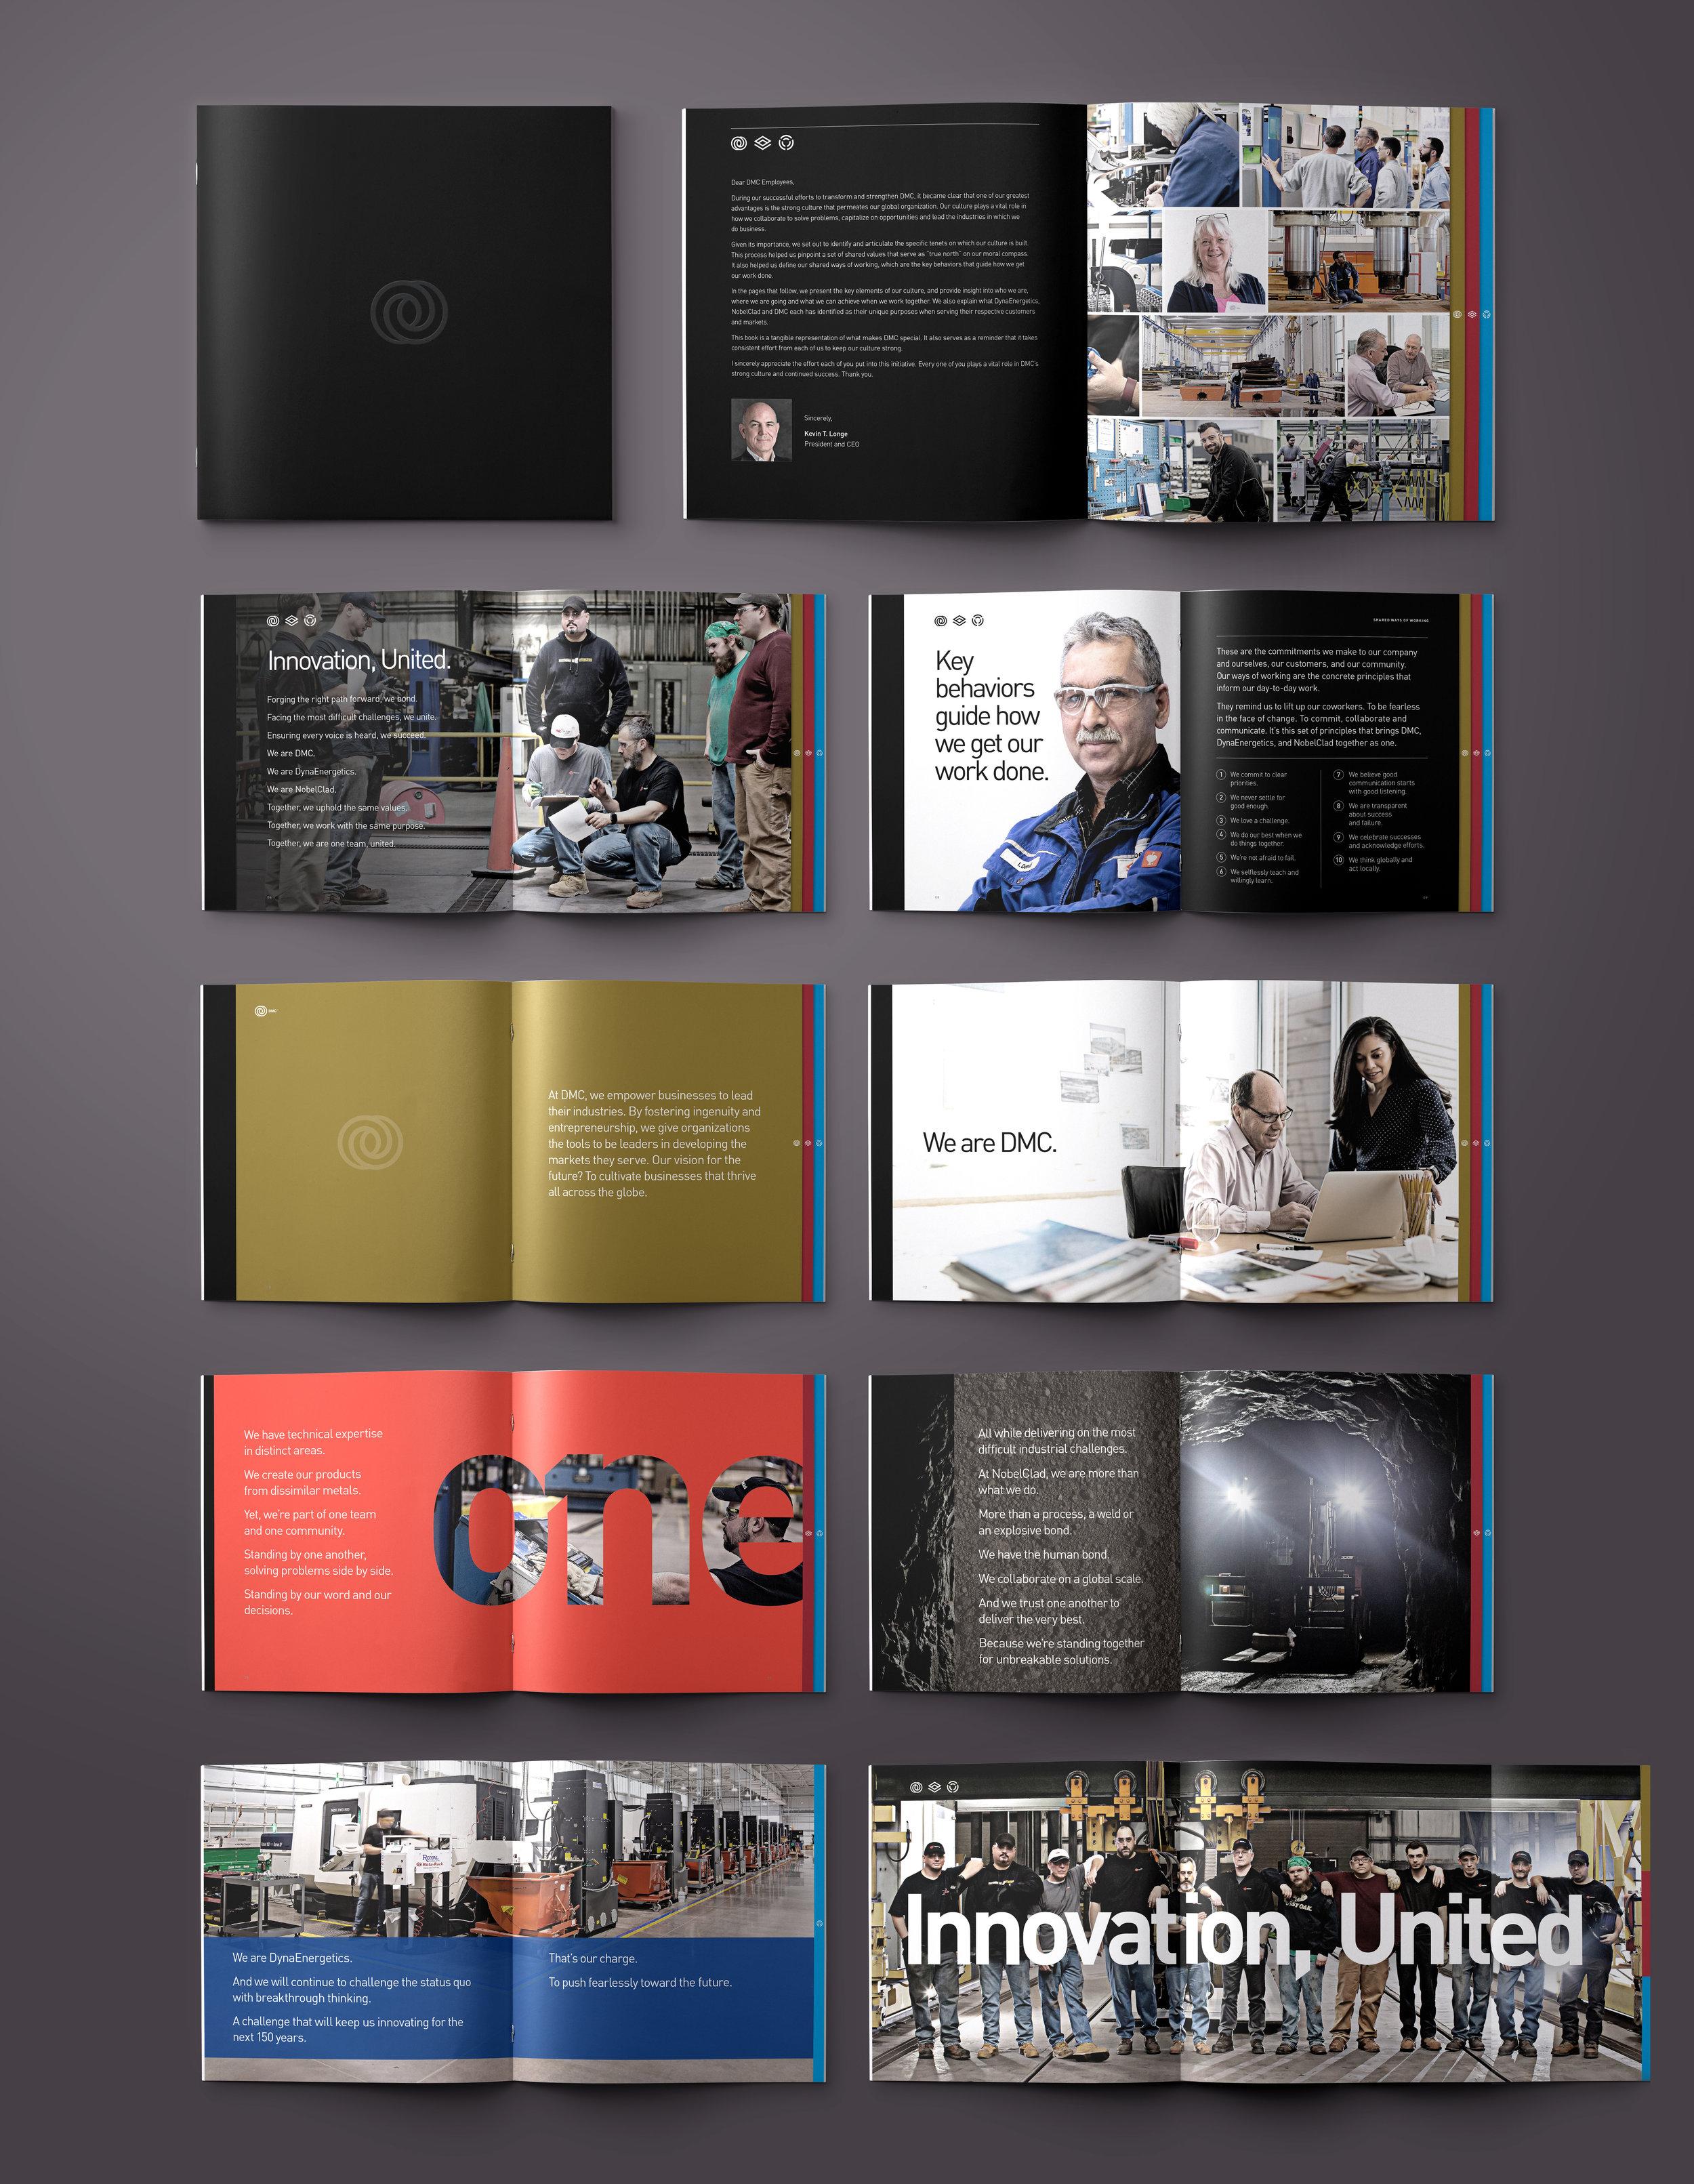 Book_All_Mockup_v1.jpg